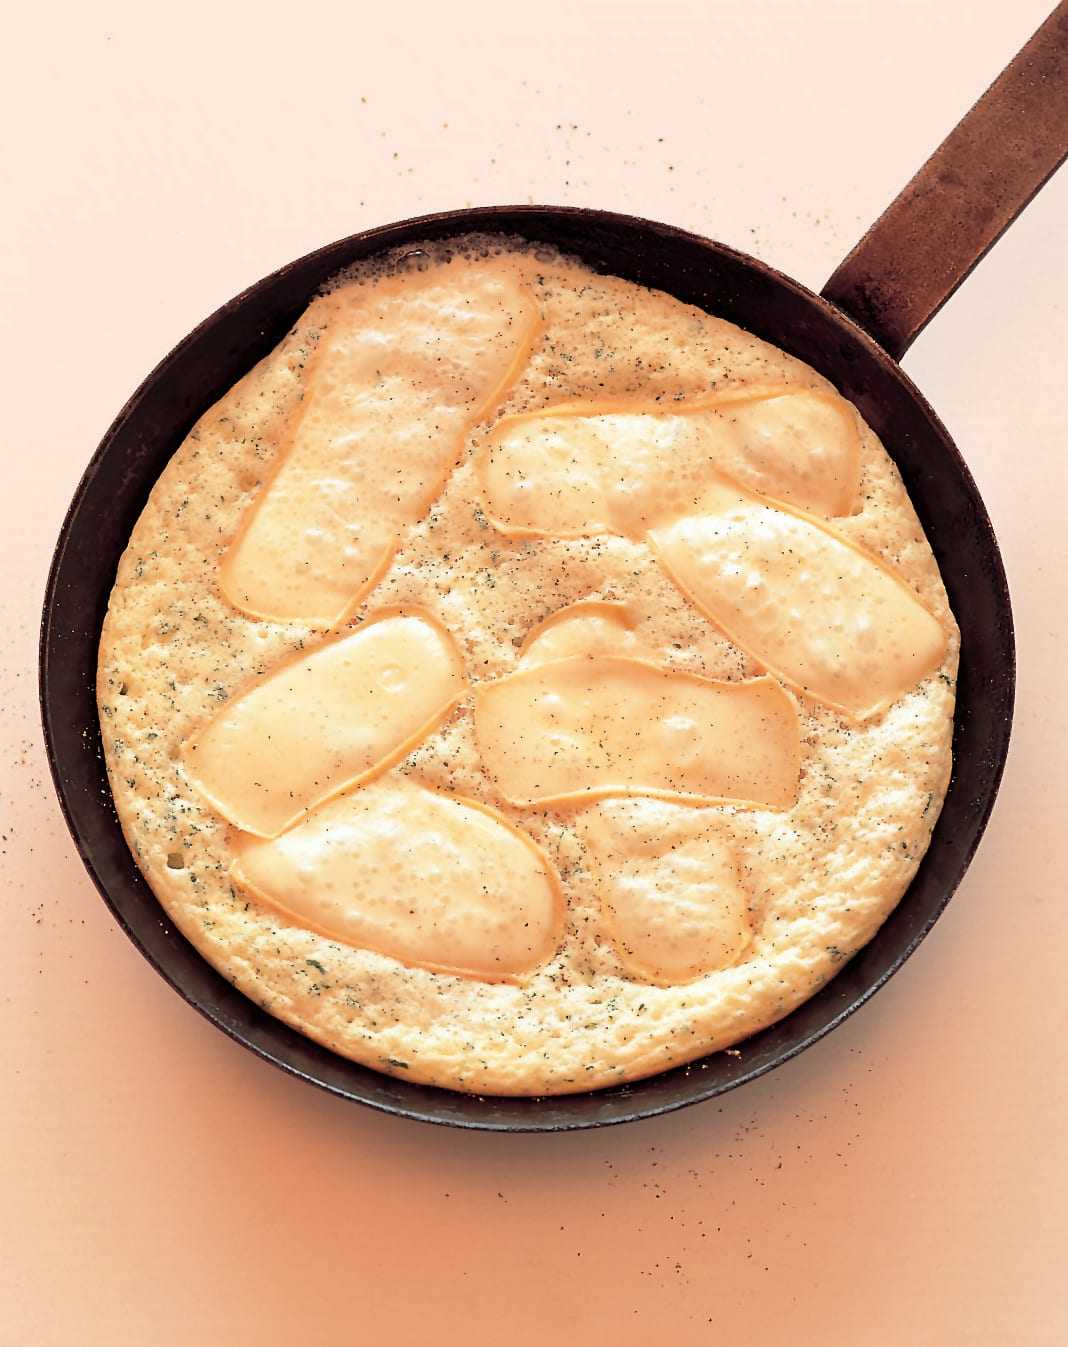 Omelette soufflée mit Reblochon